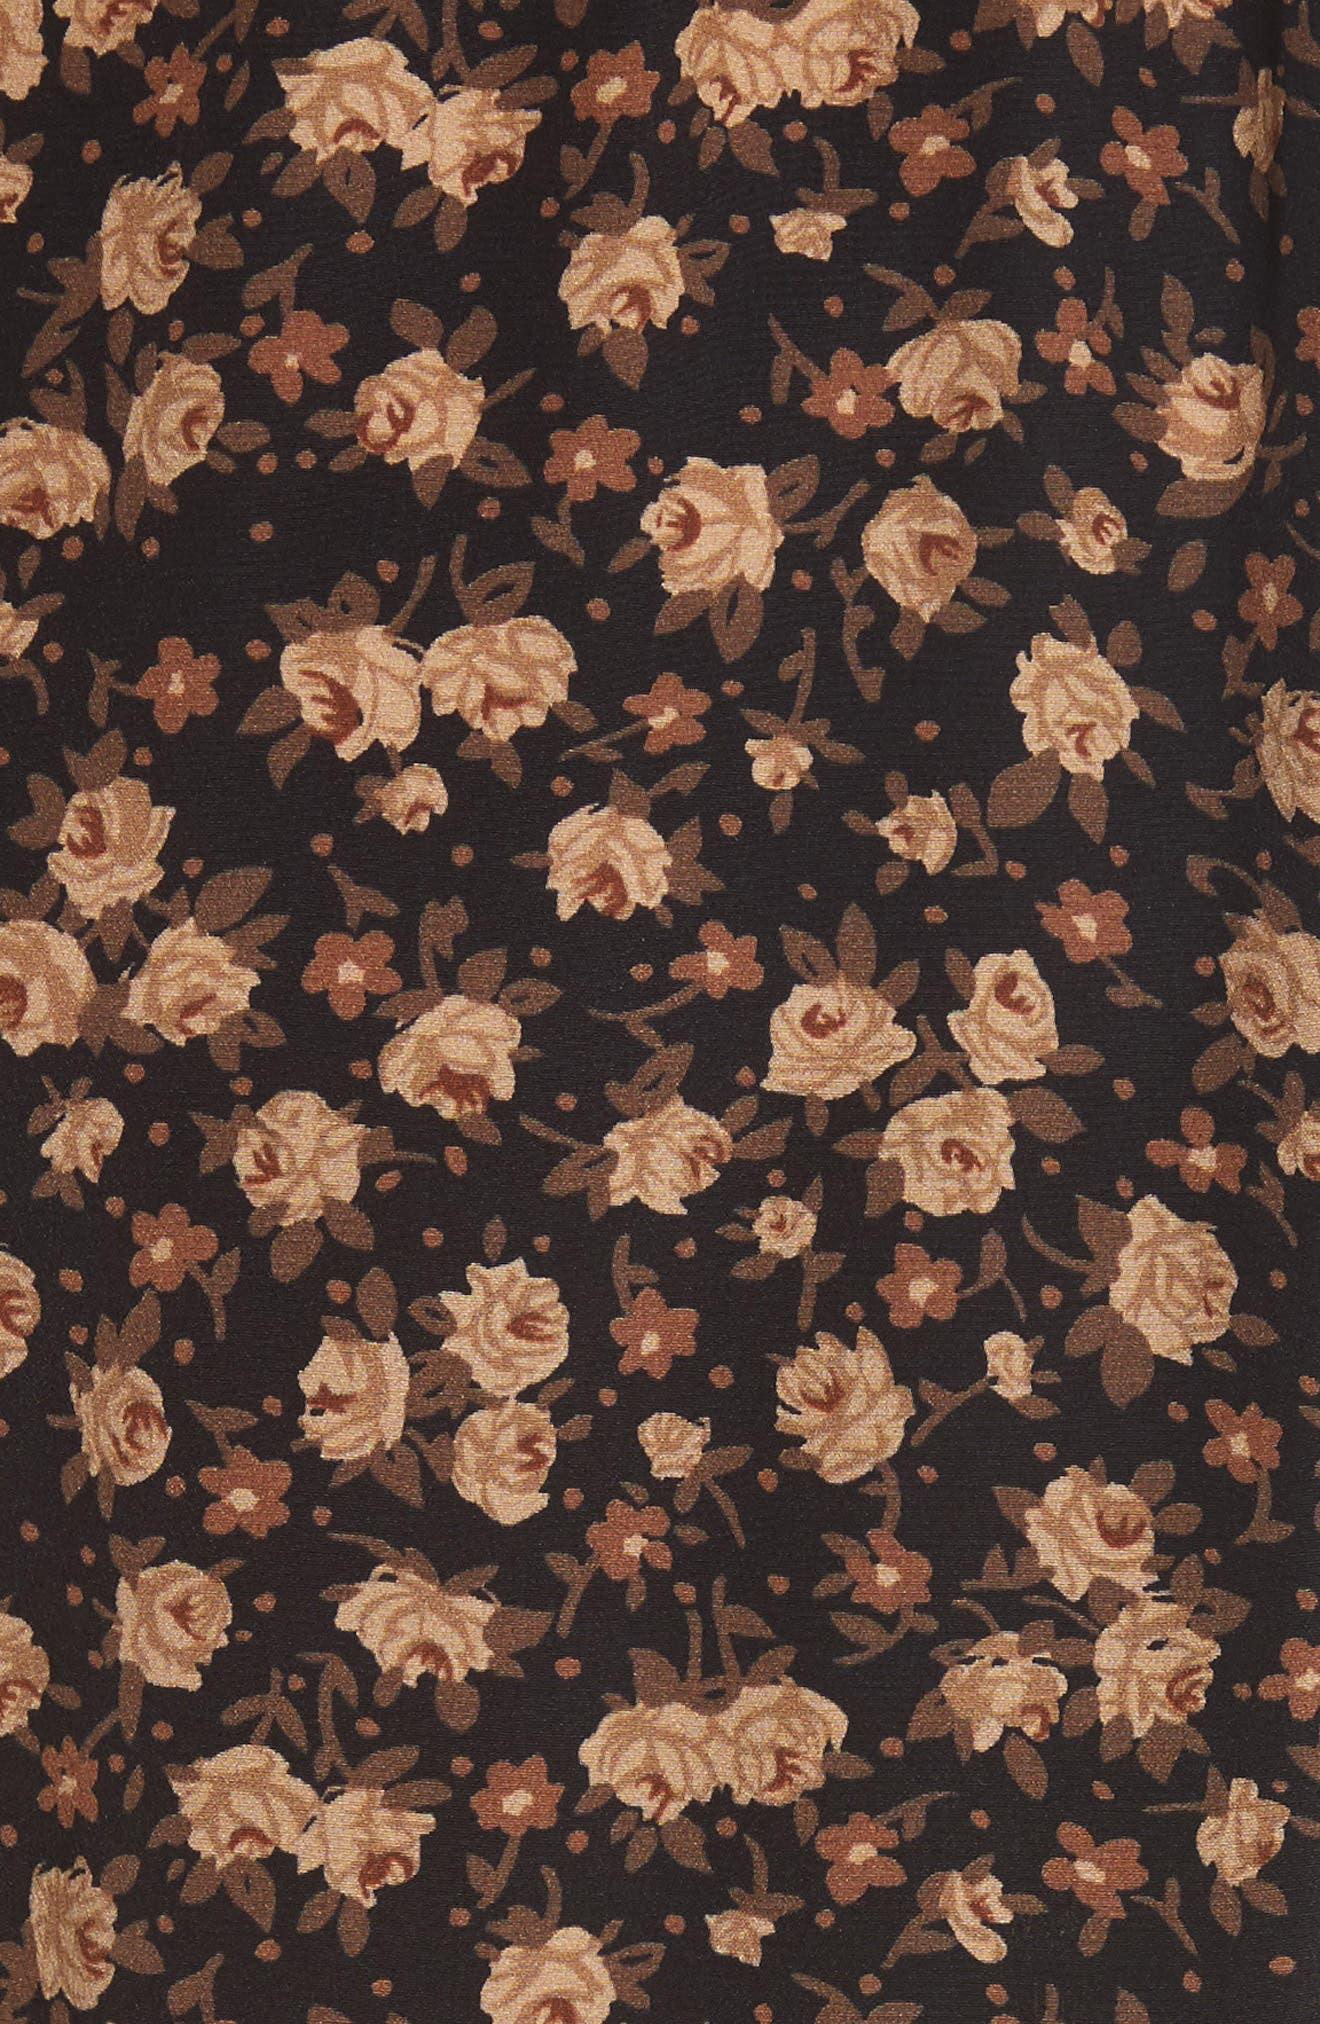 Dirndl Silk Floral Midi Skirt,                             Alternate thumbnail 6, color,                             007